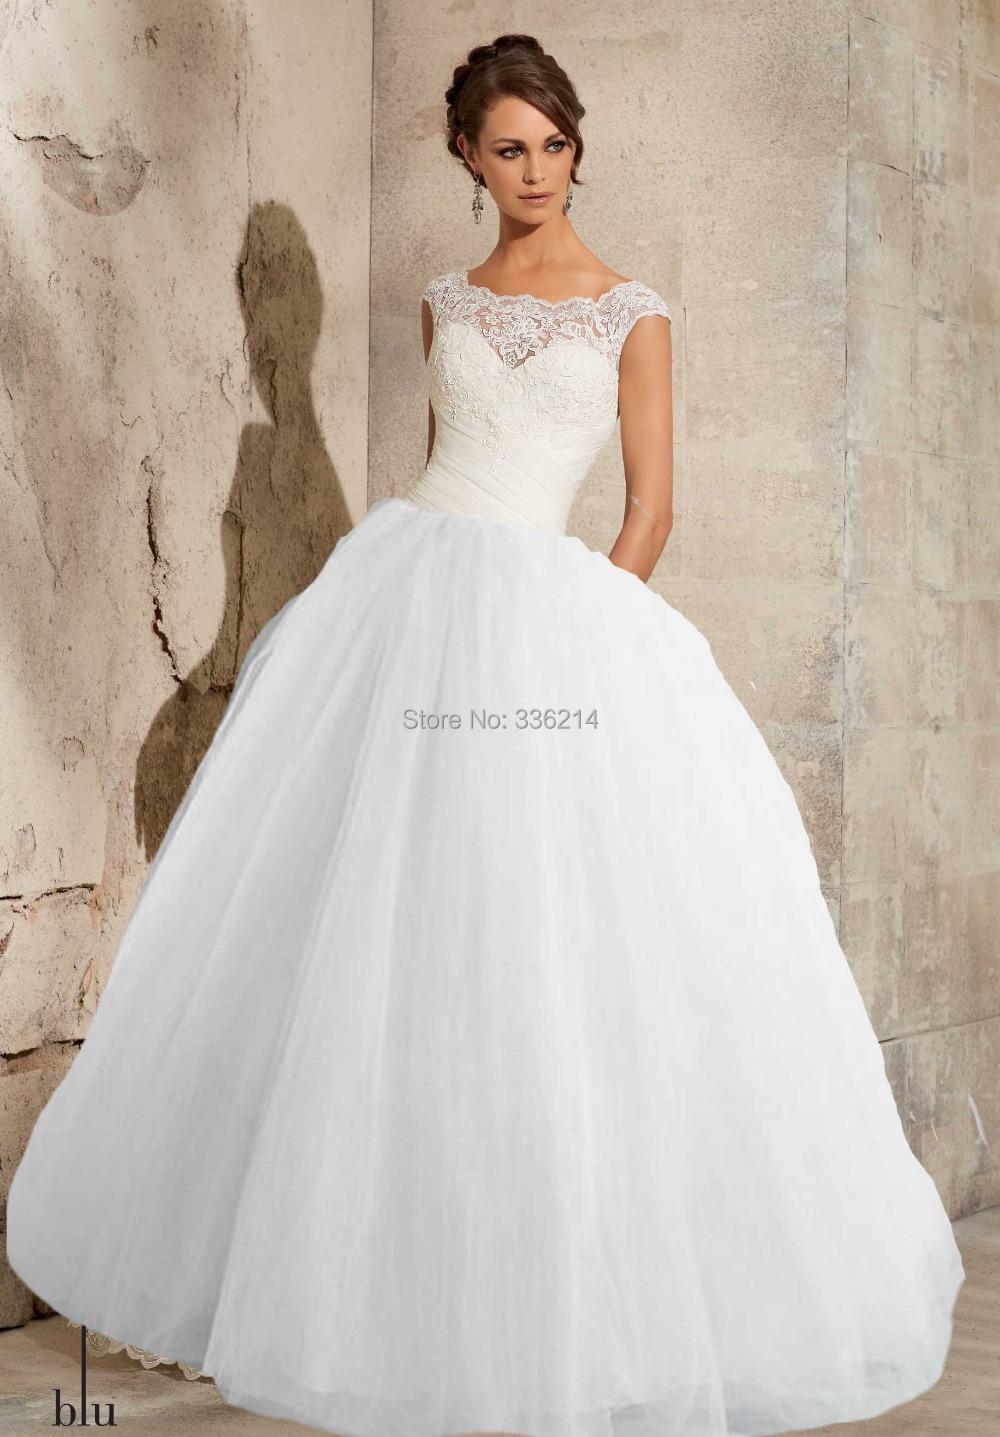 eb56e41a25e4 tallerdelapiz: 2 Piece Plus size wedding ceremony dresses